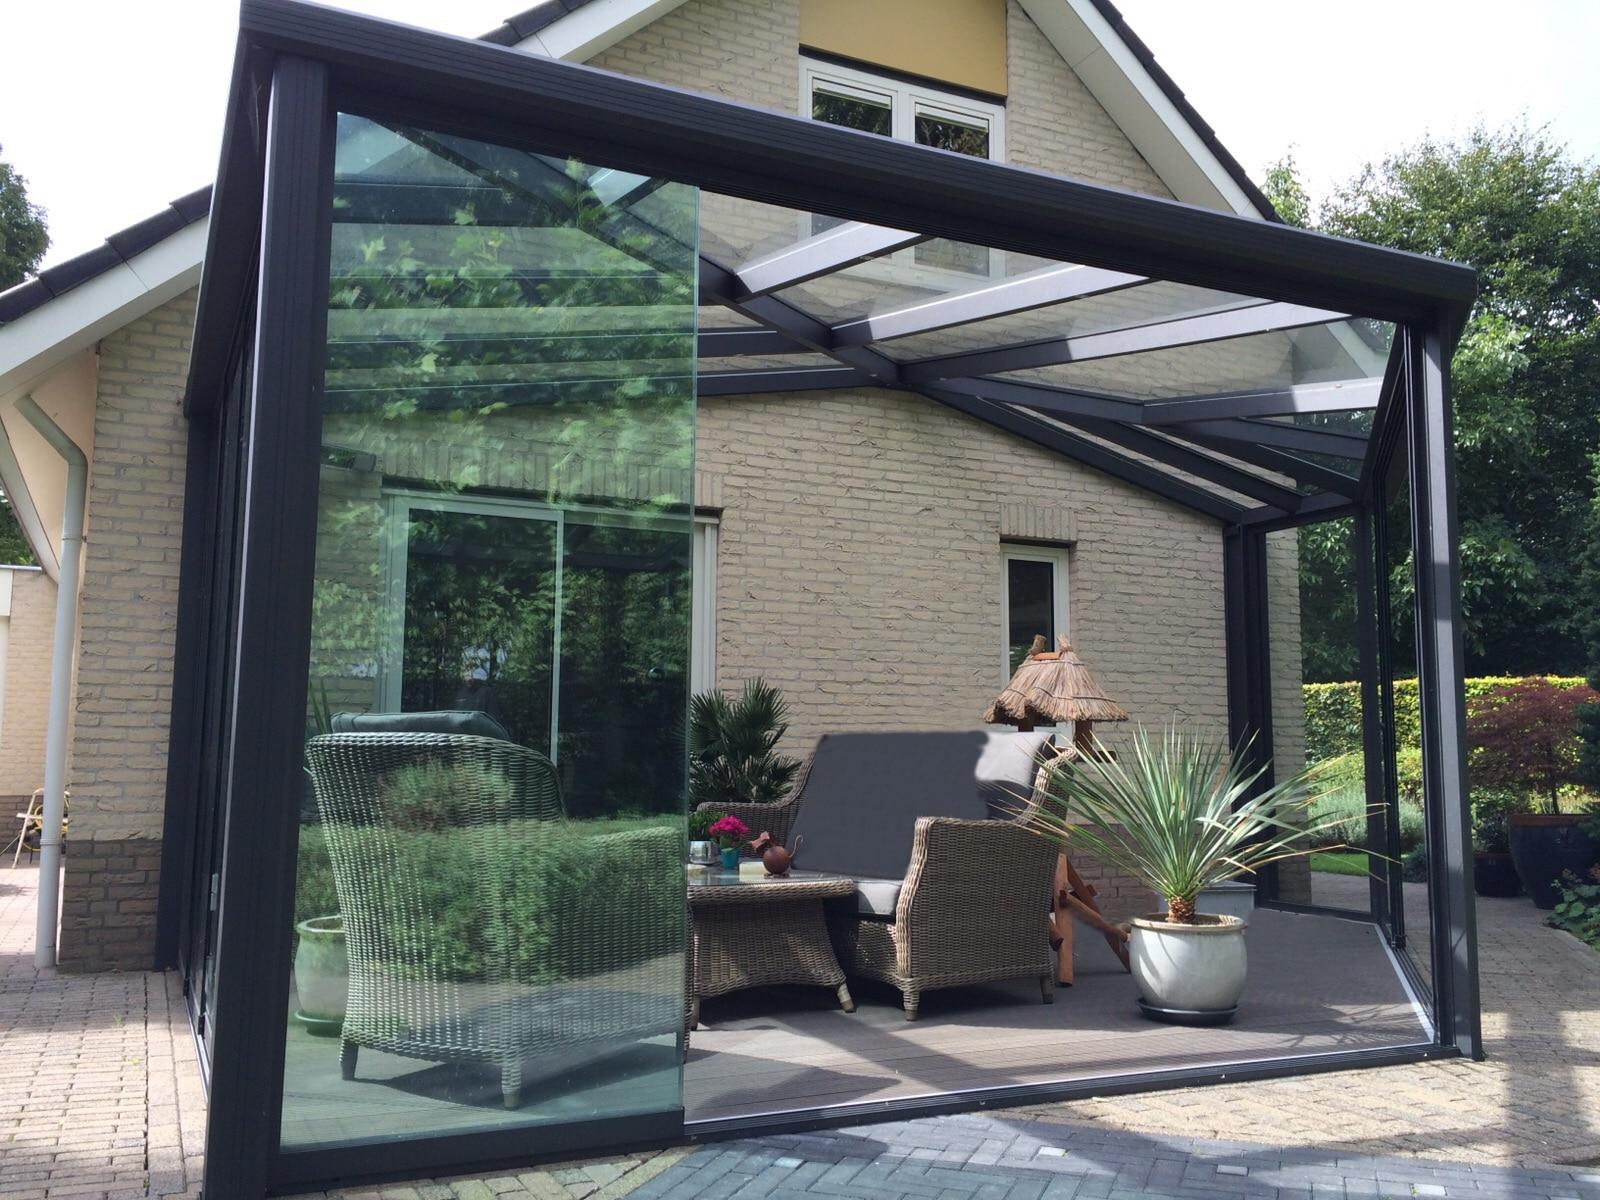 5-hoekige antraciet aluminium tuinkamer met visgraad dak